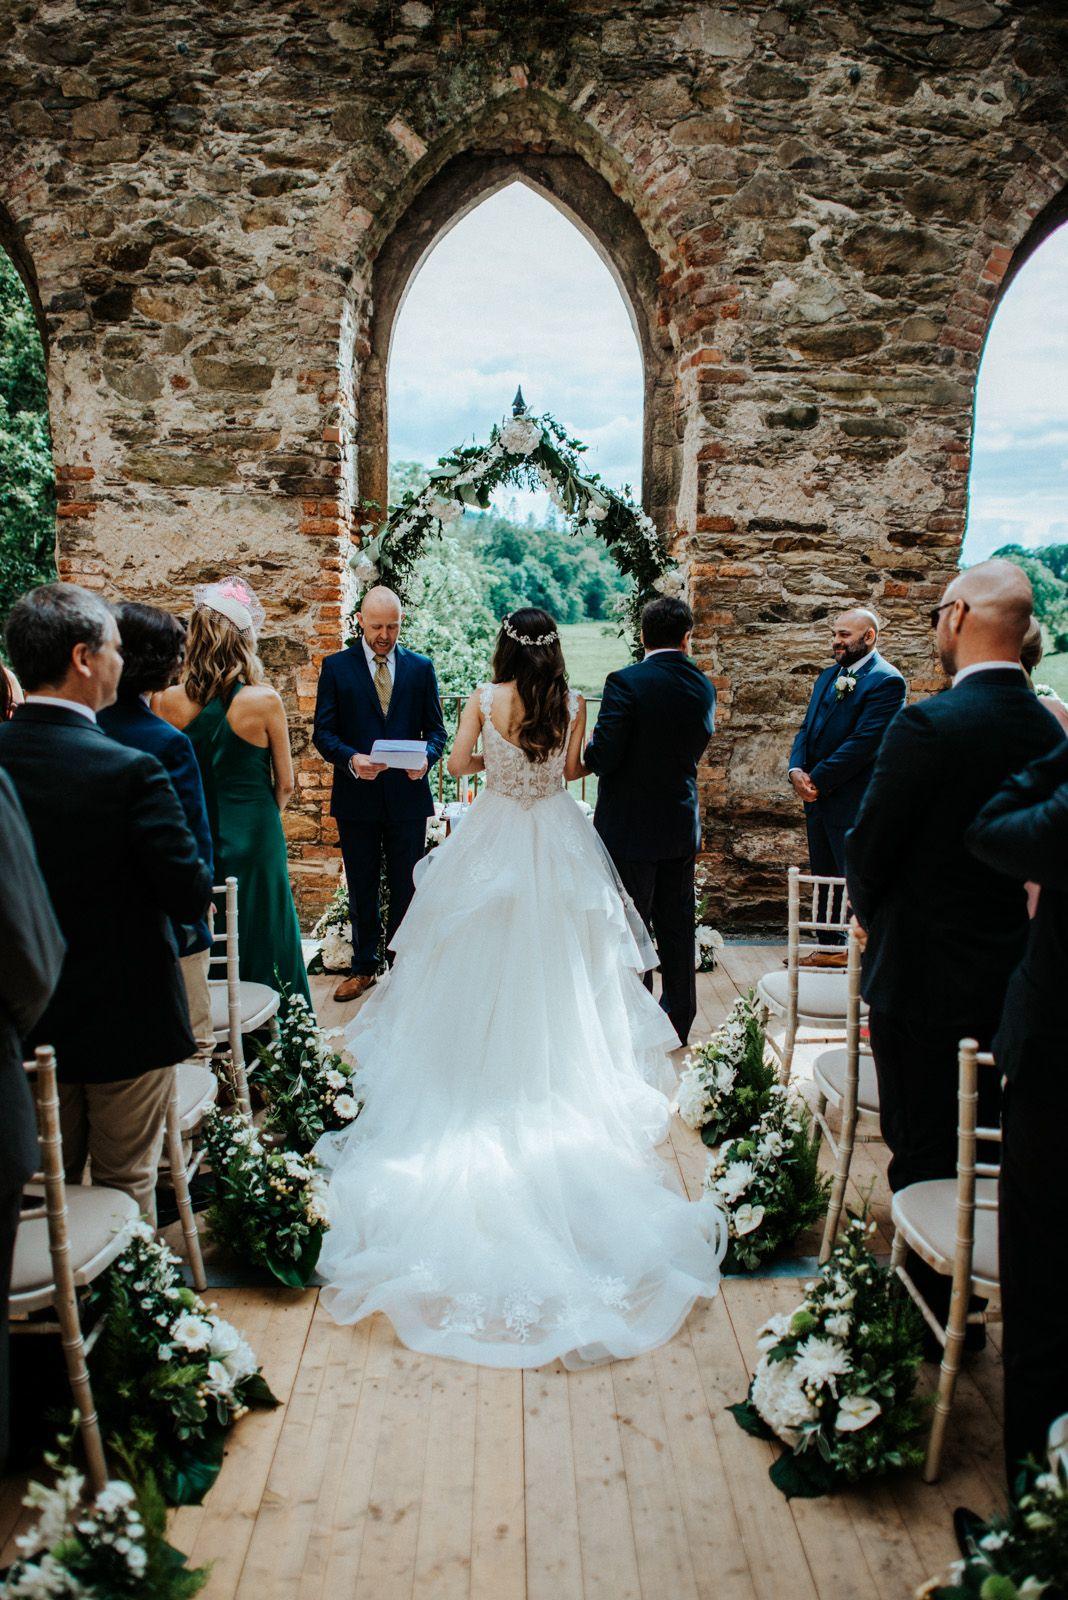 Beautiful castle ruin wedding in Ireland in 2020 Ireland